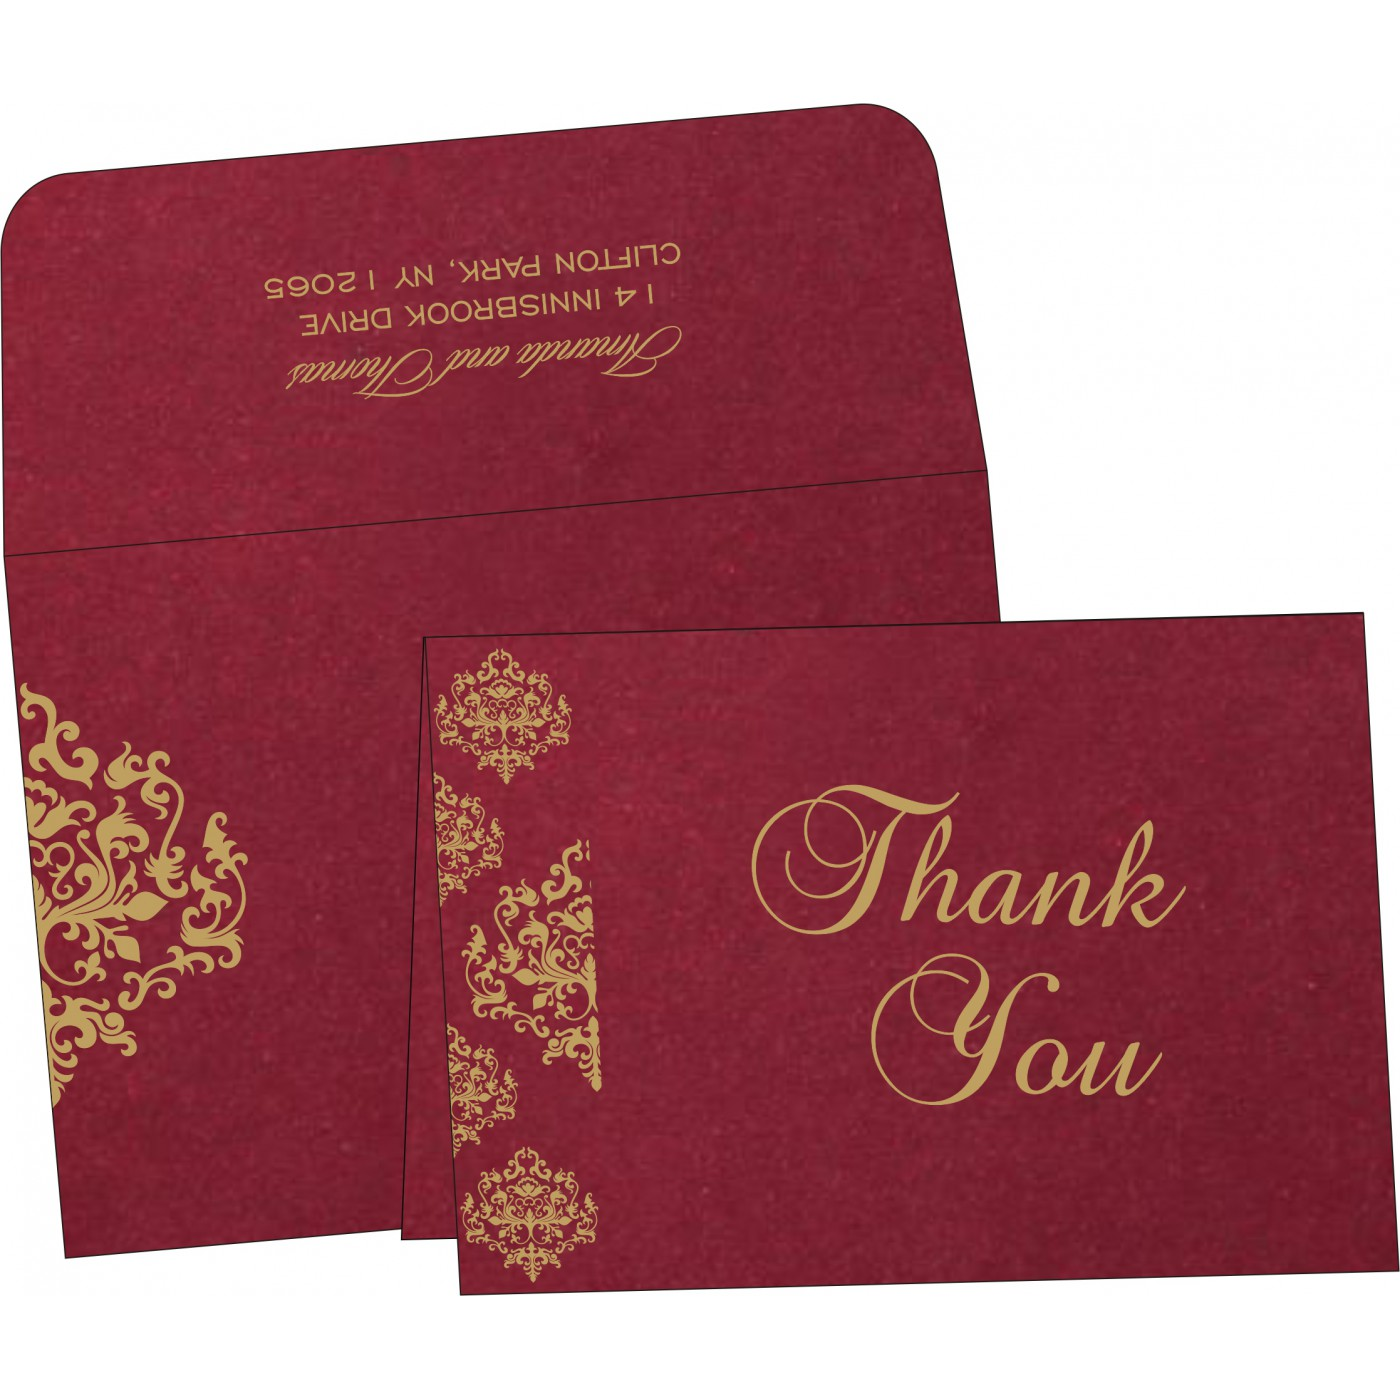 Thank You Cards : CTYC-8254B - IndianWeddingCards